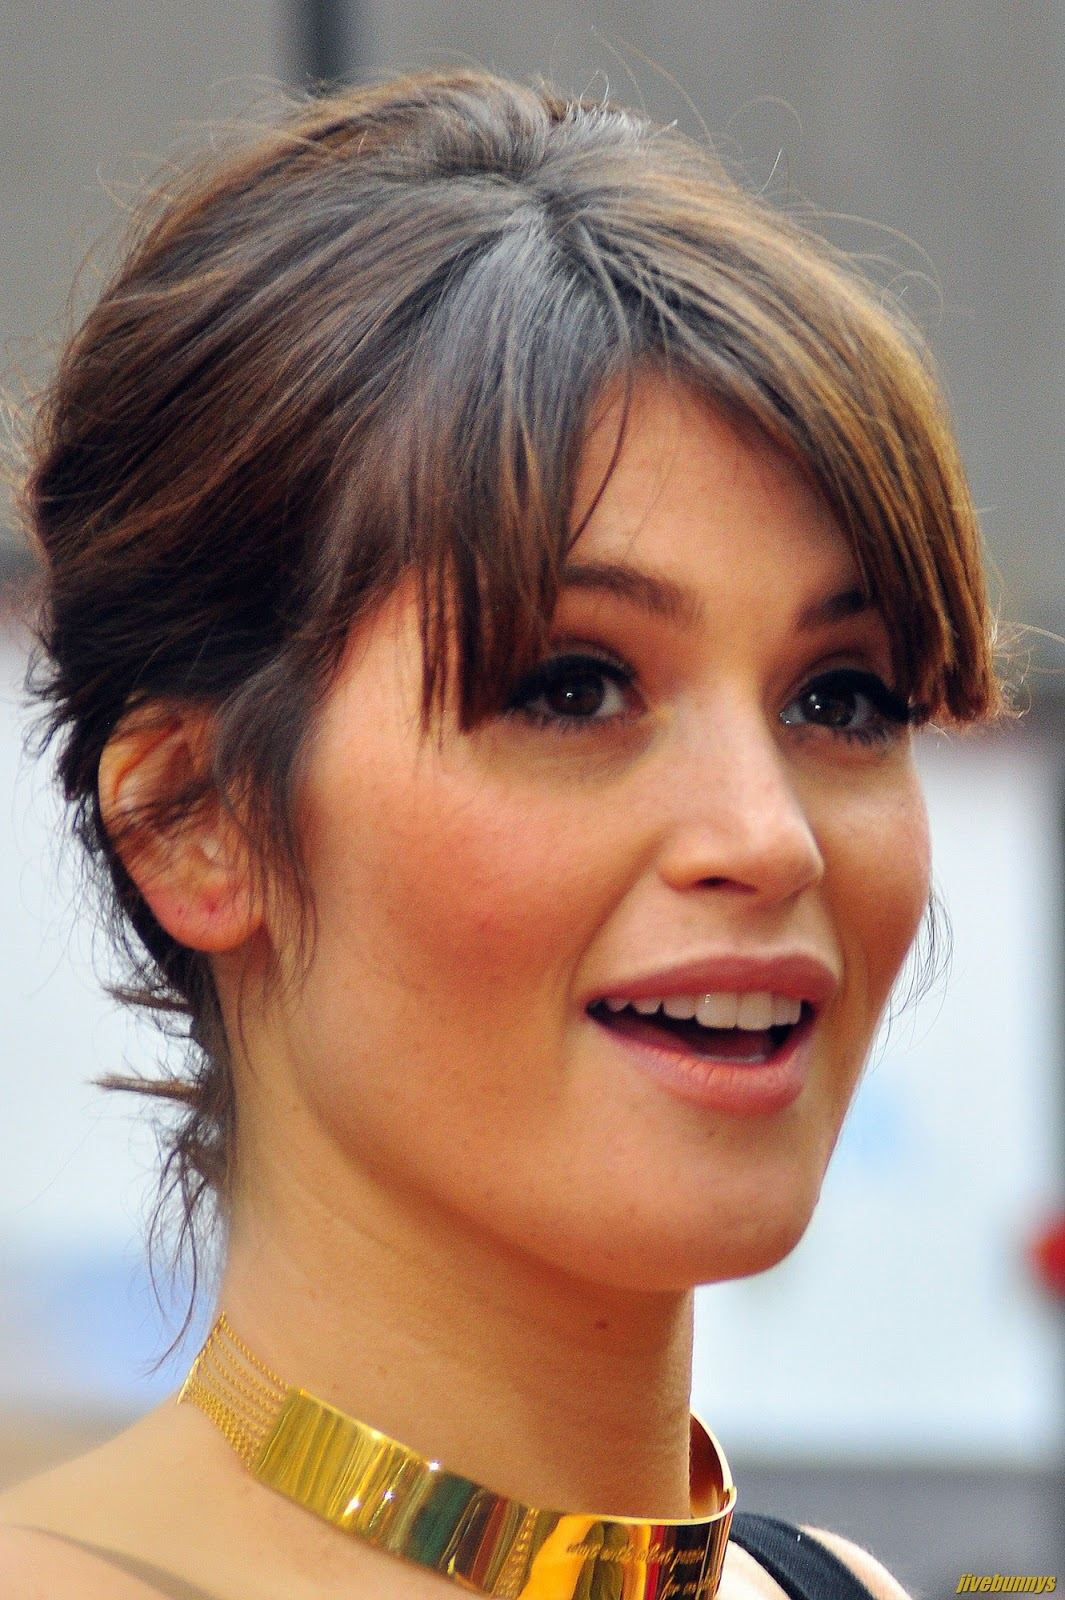 jivebunnys female celebrity picture gallery gemma arterton sexy